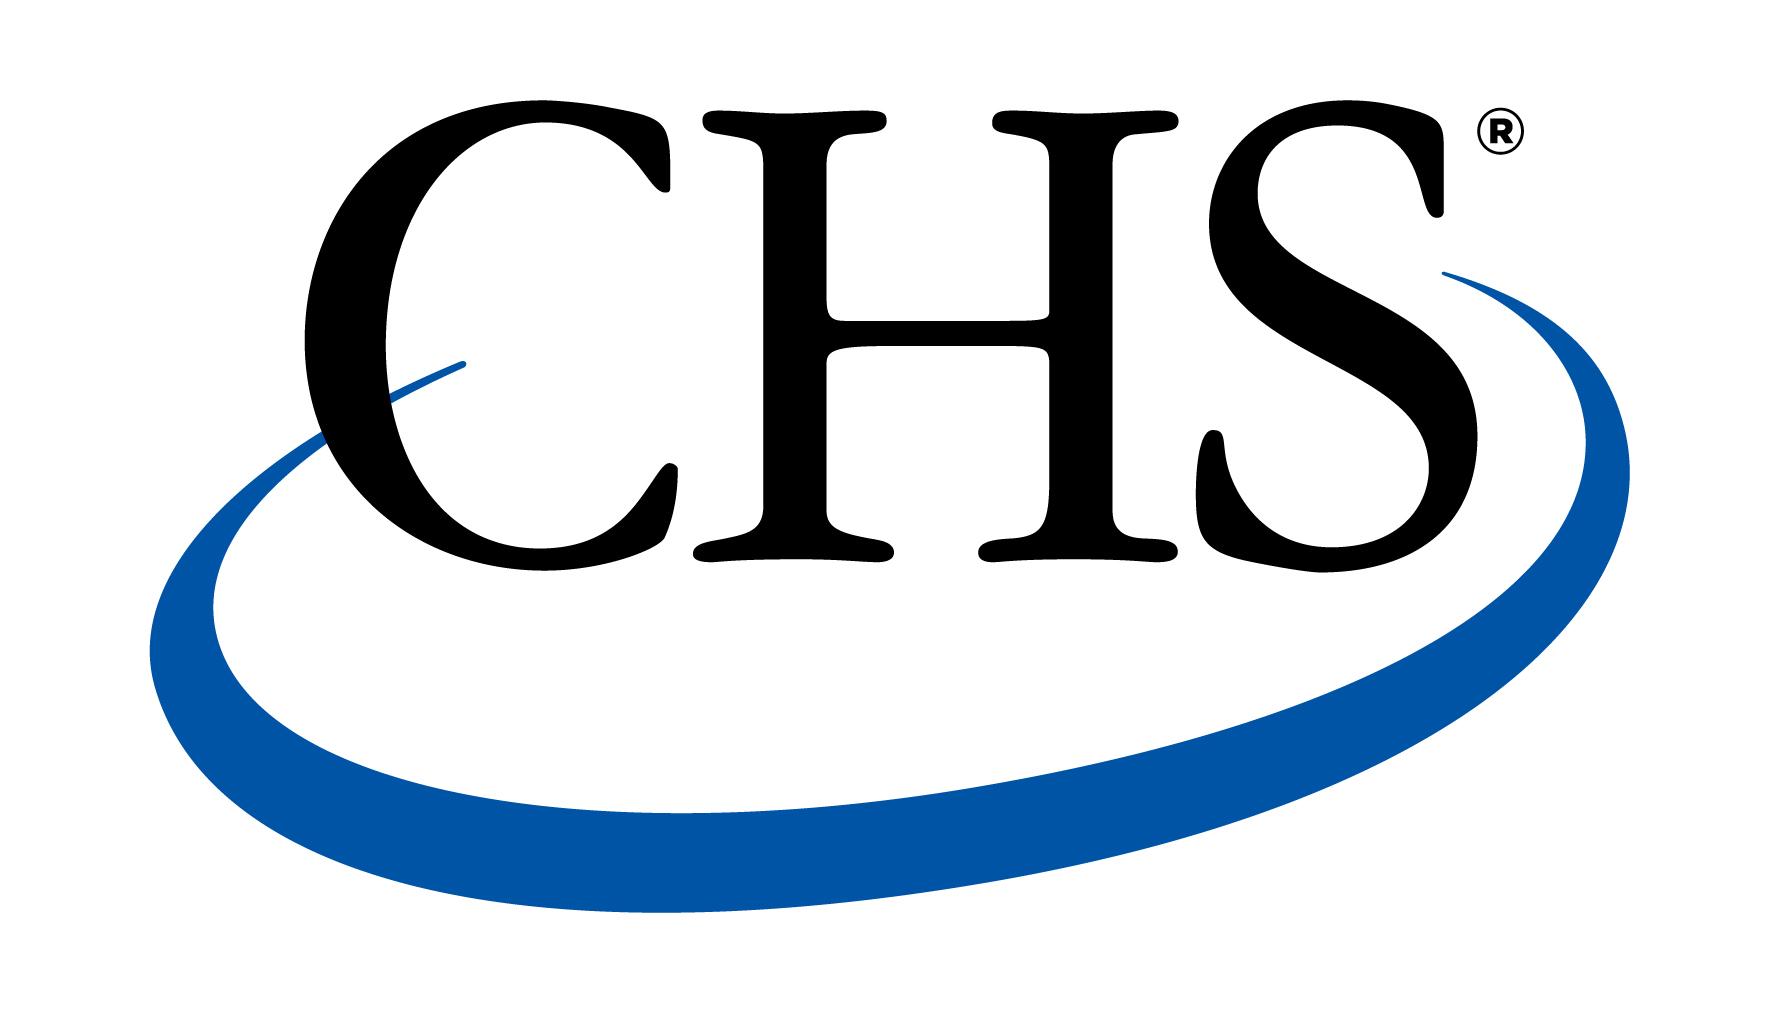 CHS Inc logo